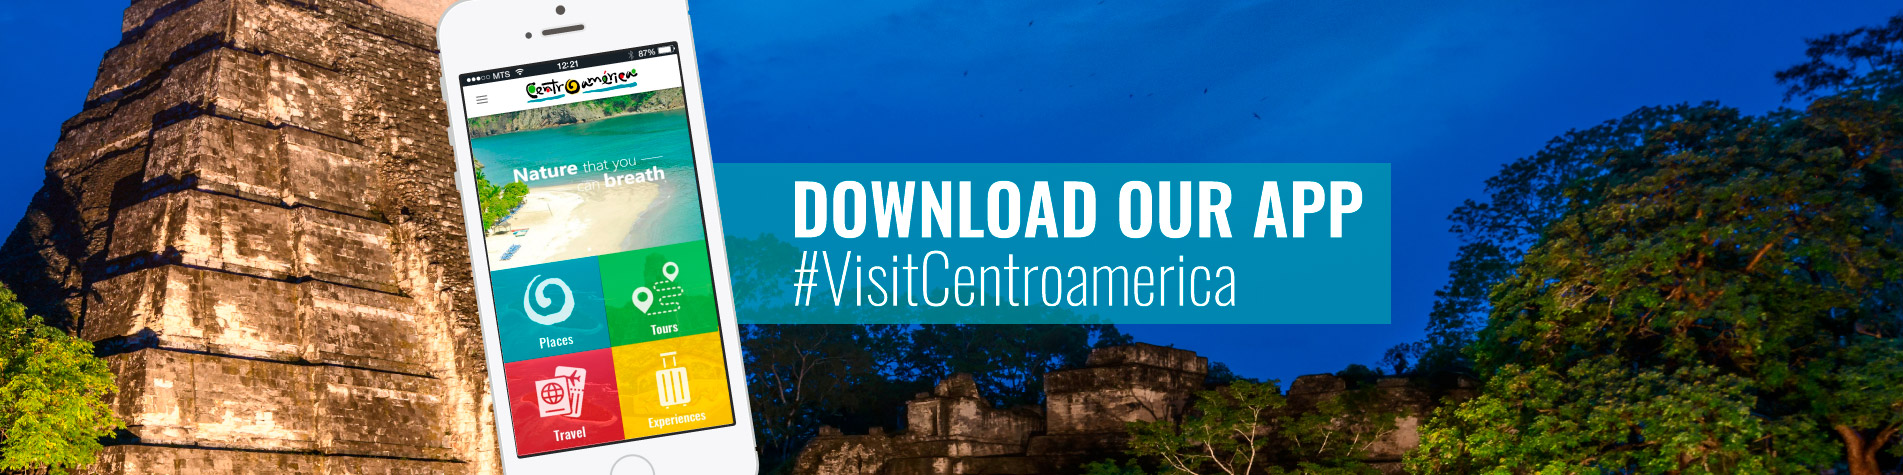 visit-centroamerica-app-download